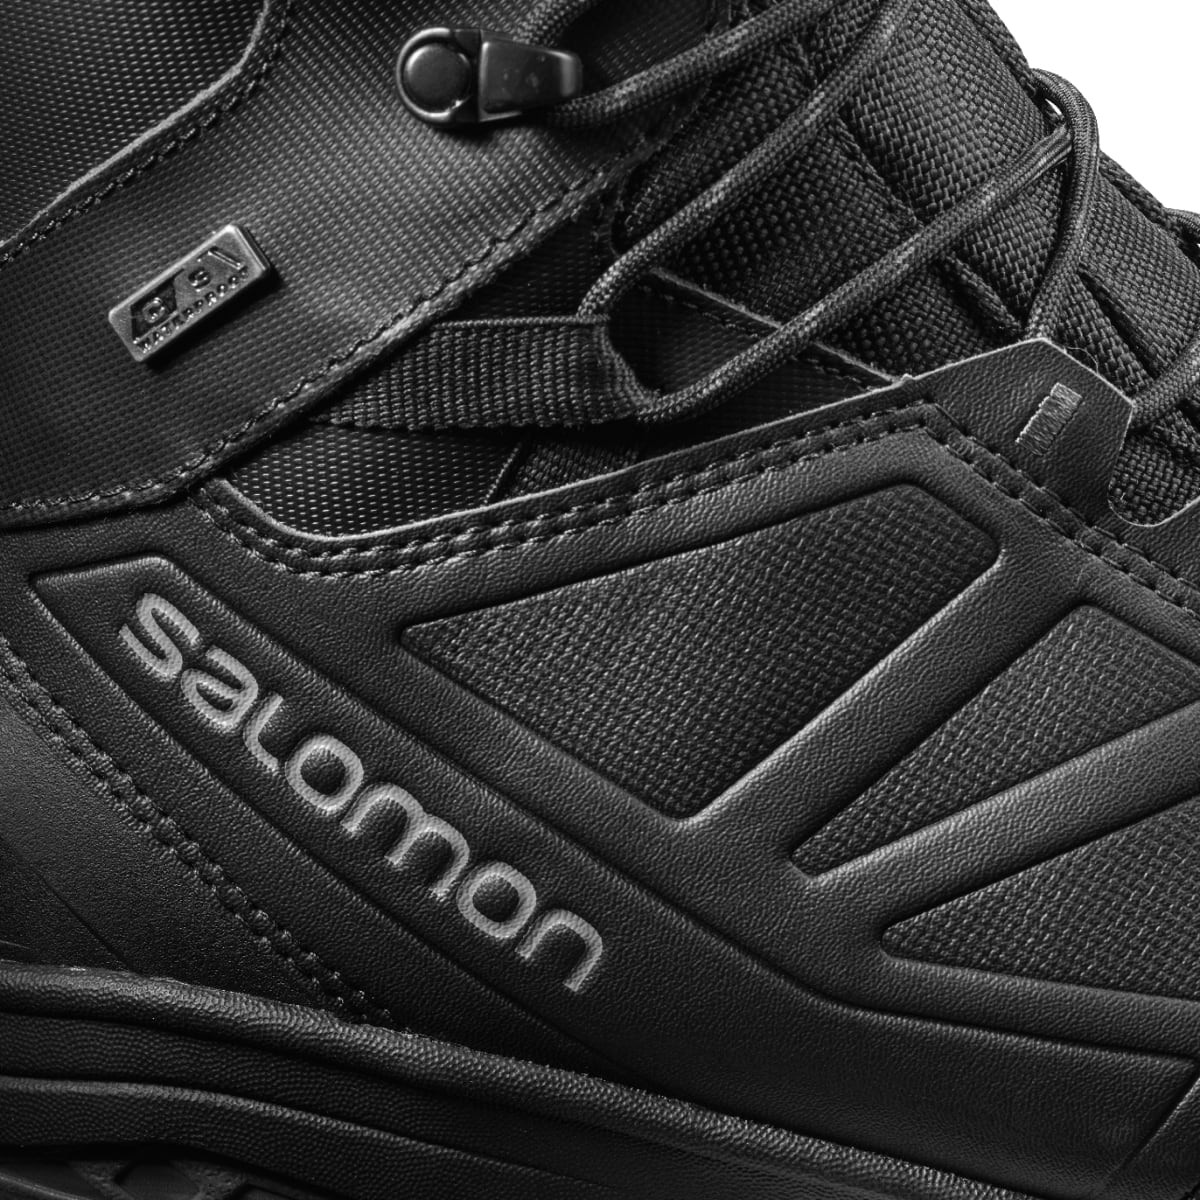 Salomon Toundra Pro CSWP BlackBlackMagnet